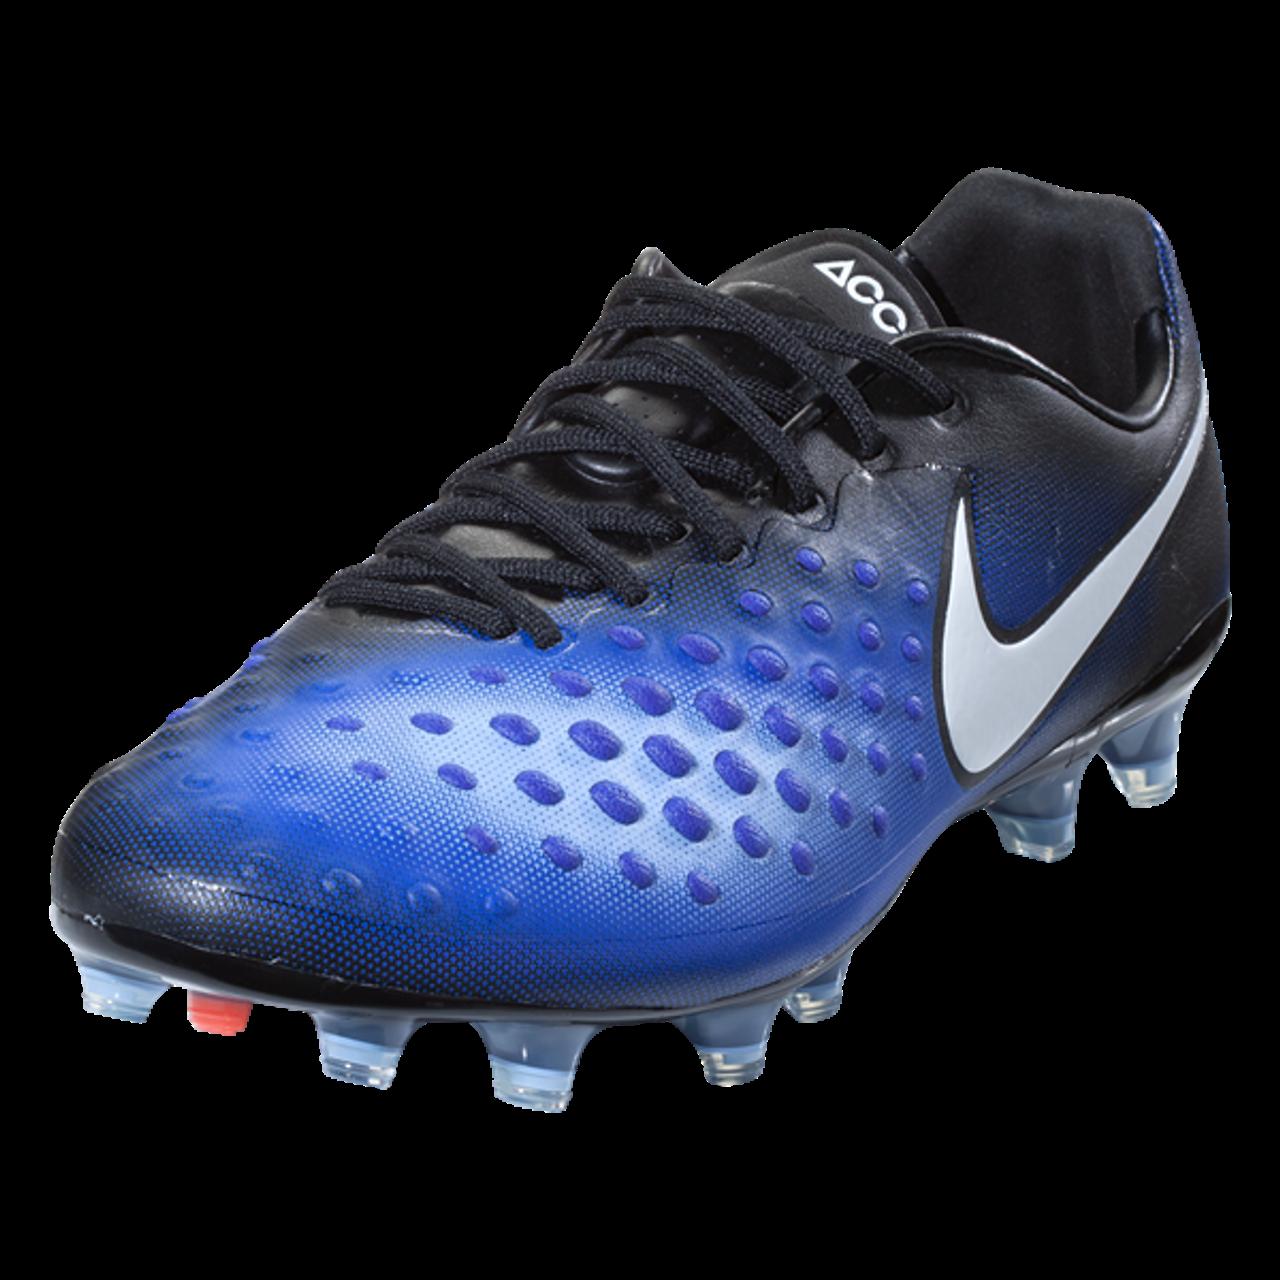 55cfcb69bfc3 Nike Magista Opus II FG - Black/White/Paramount Blue/Aluminum - ohp soccer